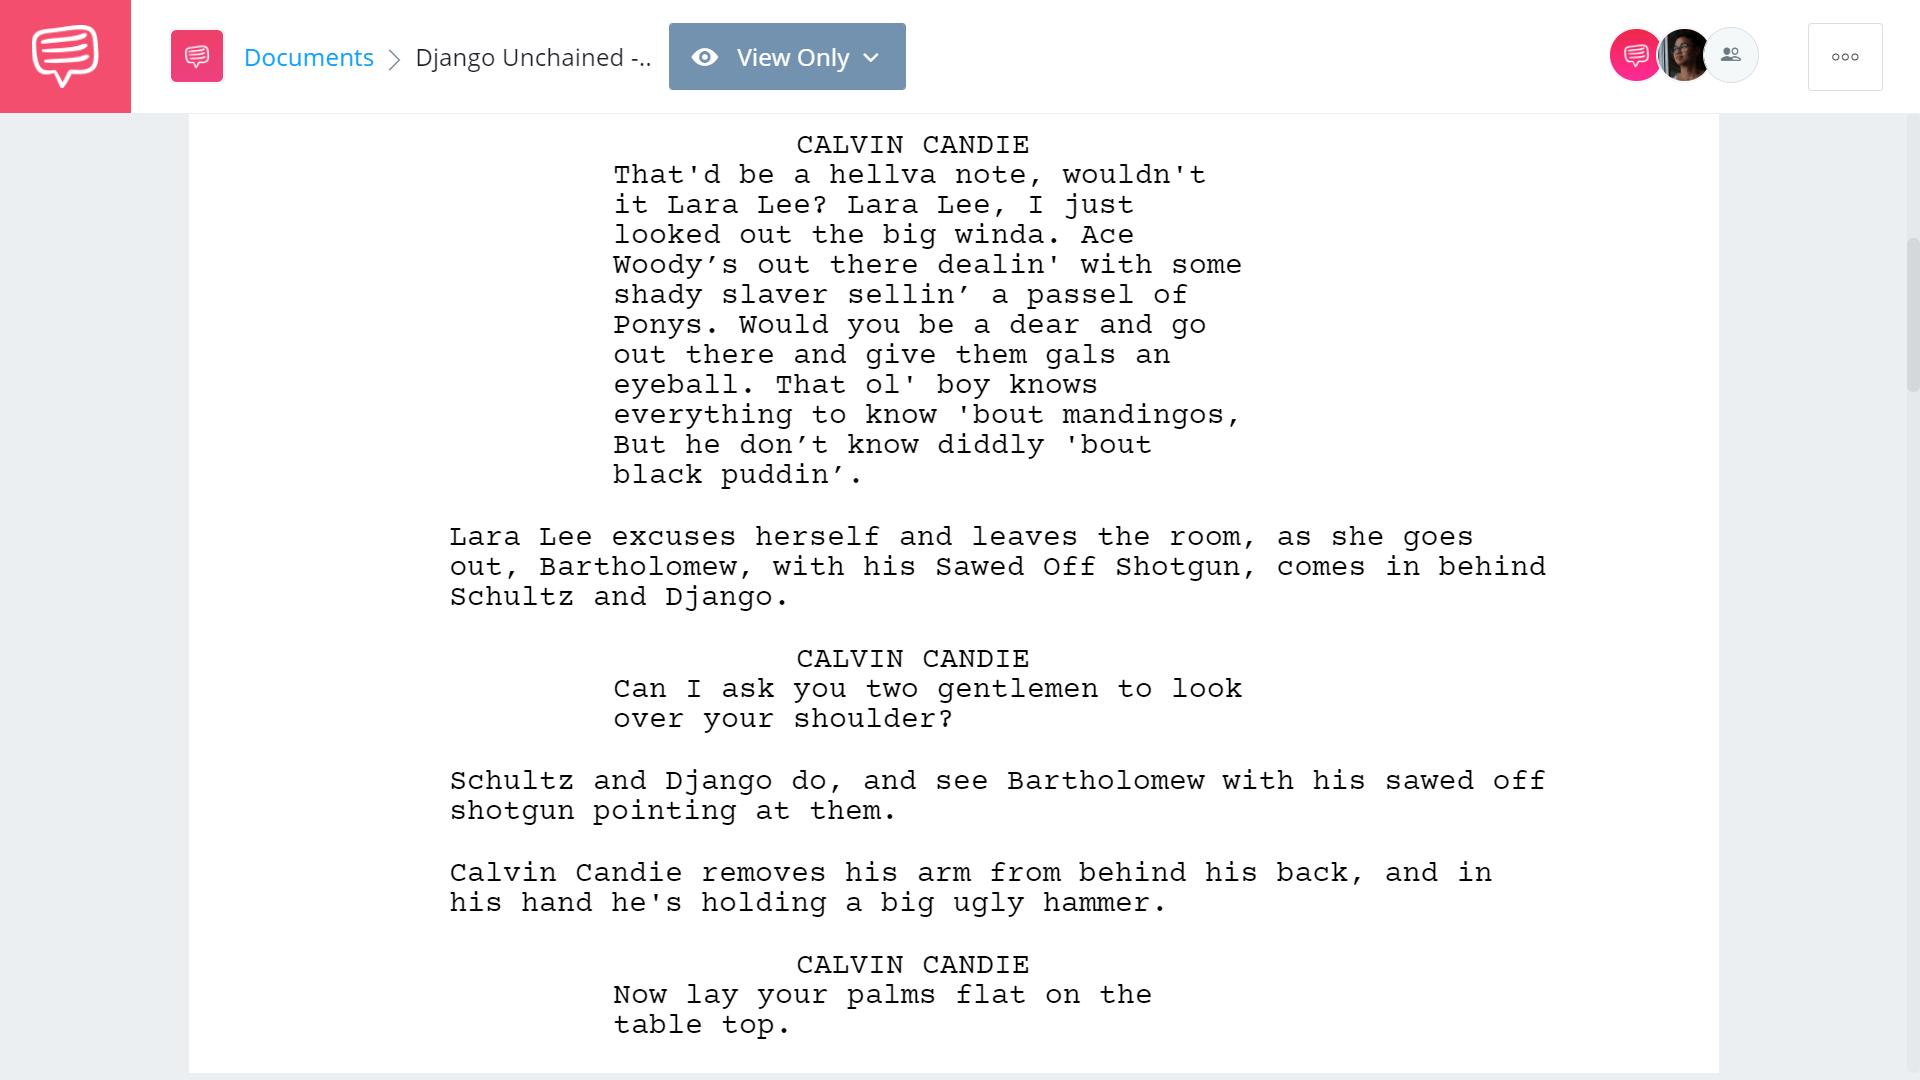 Django Unchained Script Teardown - Calvin Candle Monologue - StudioBinder Screenwriting Software